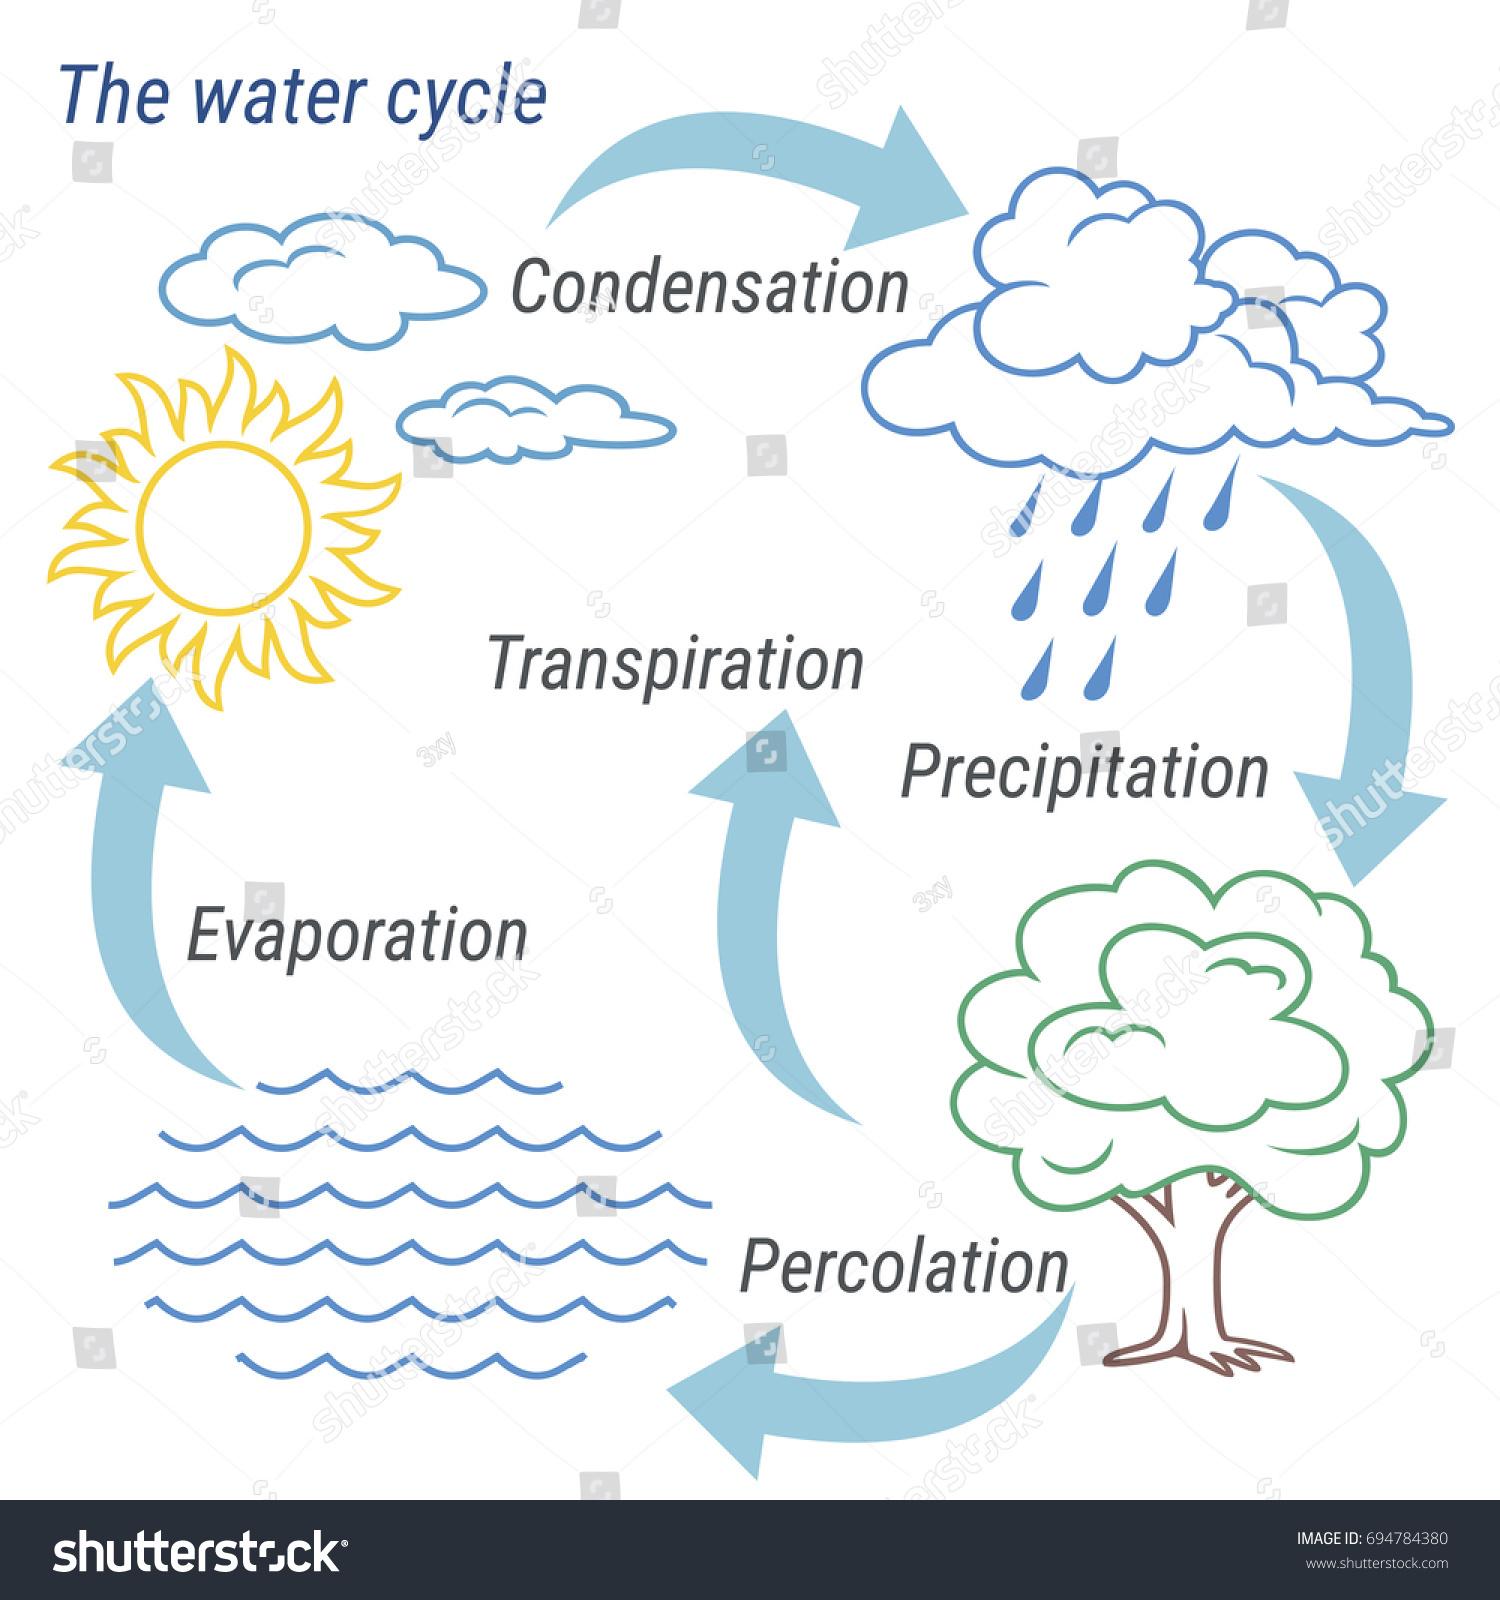 Diagram for water cycle 2003 formula computer definition kohler vector schematic representation water cycle nature stock vector stock vector vector schematic representation of the water ccuart Choice Image